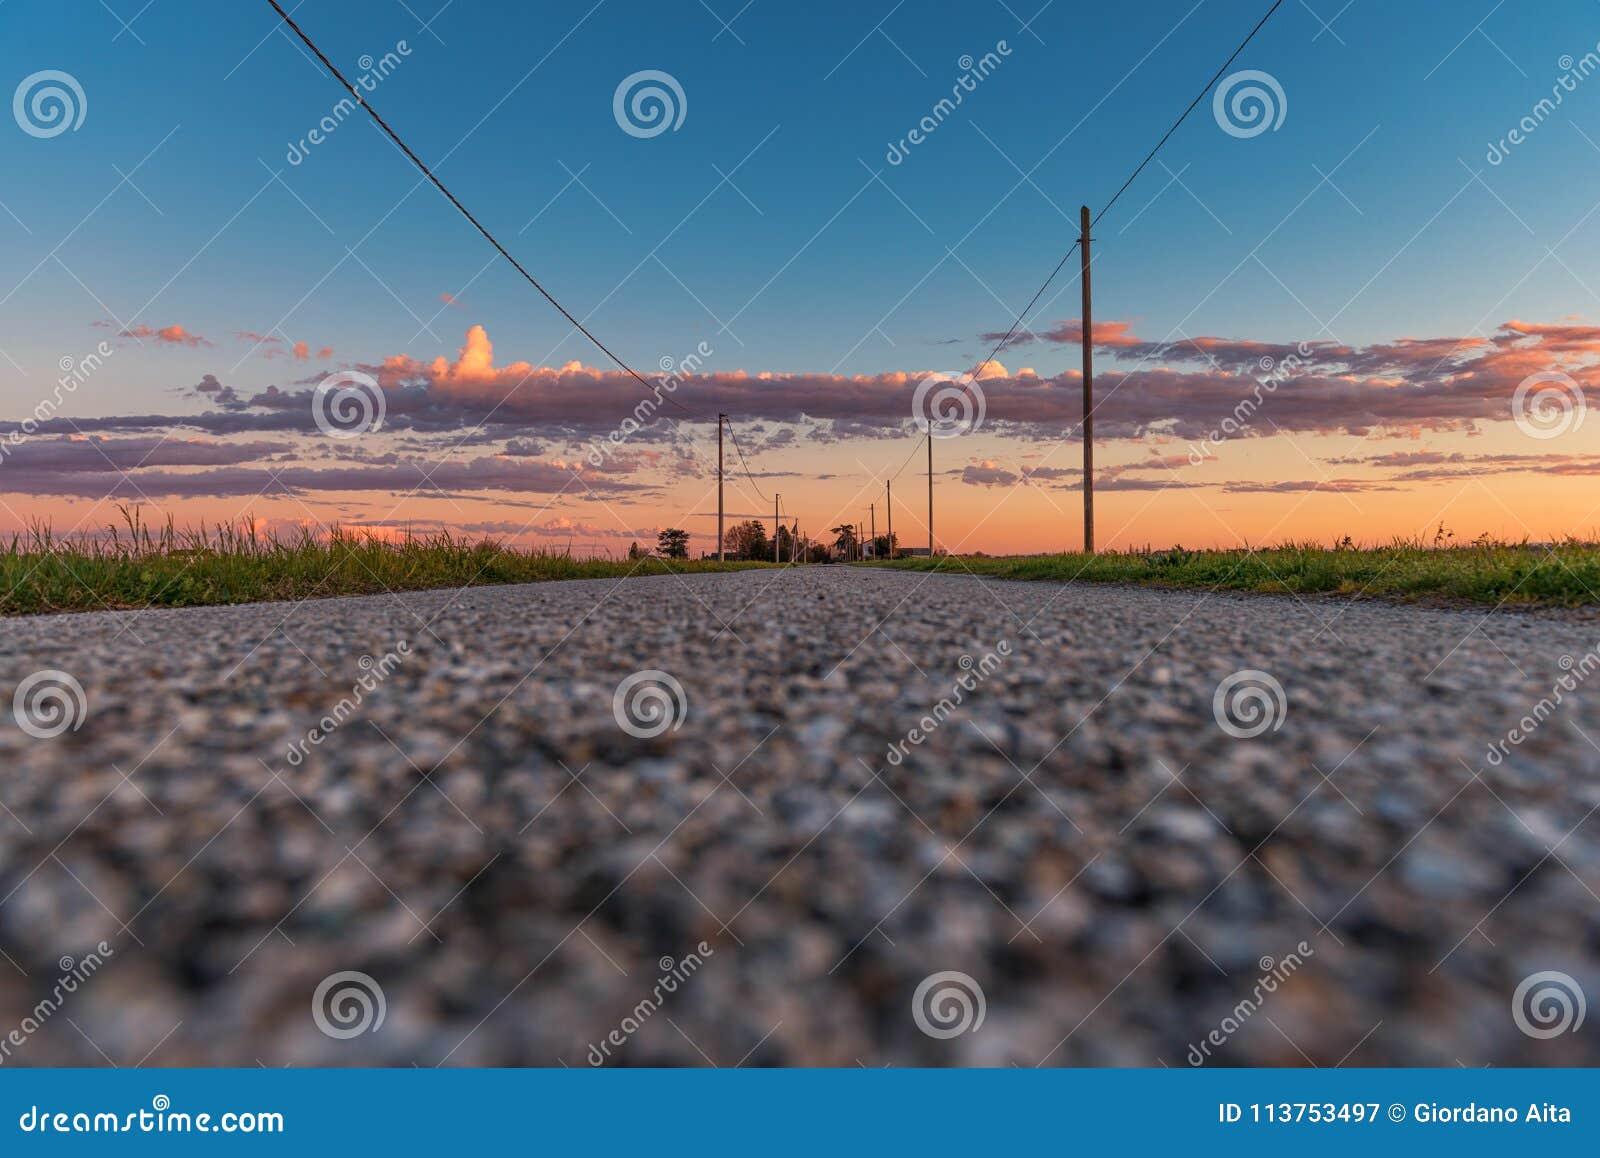 Plattelandsweg in zonsondergangtijd